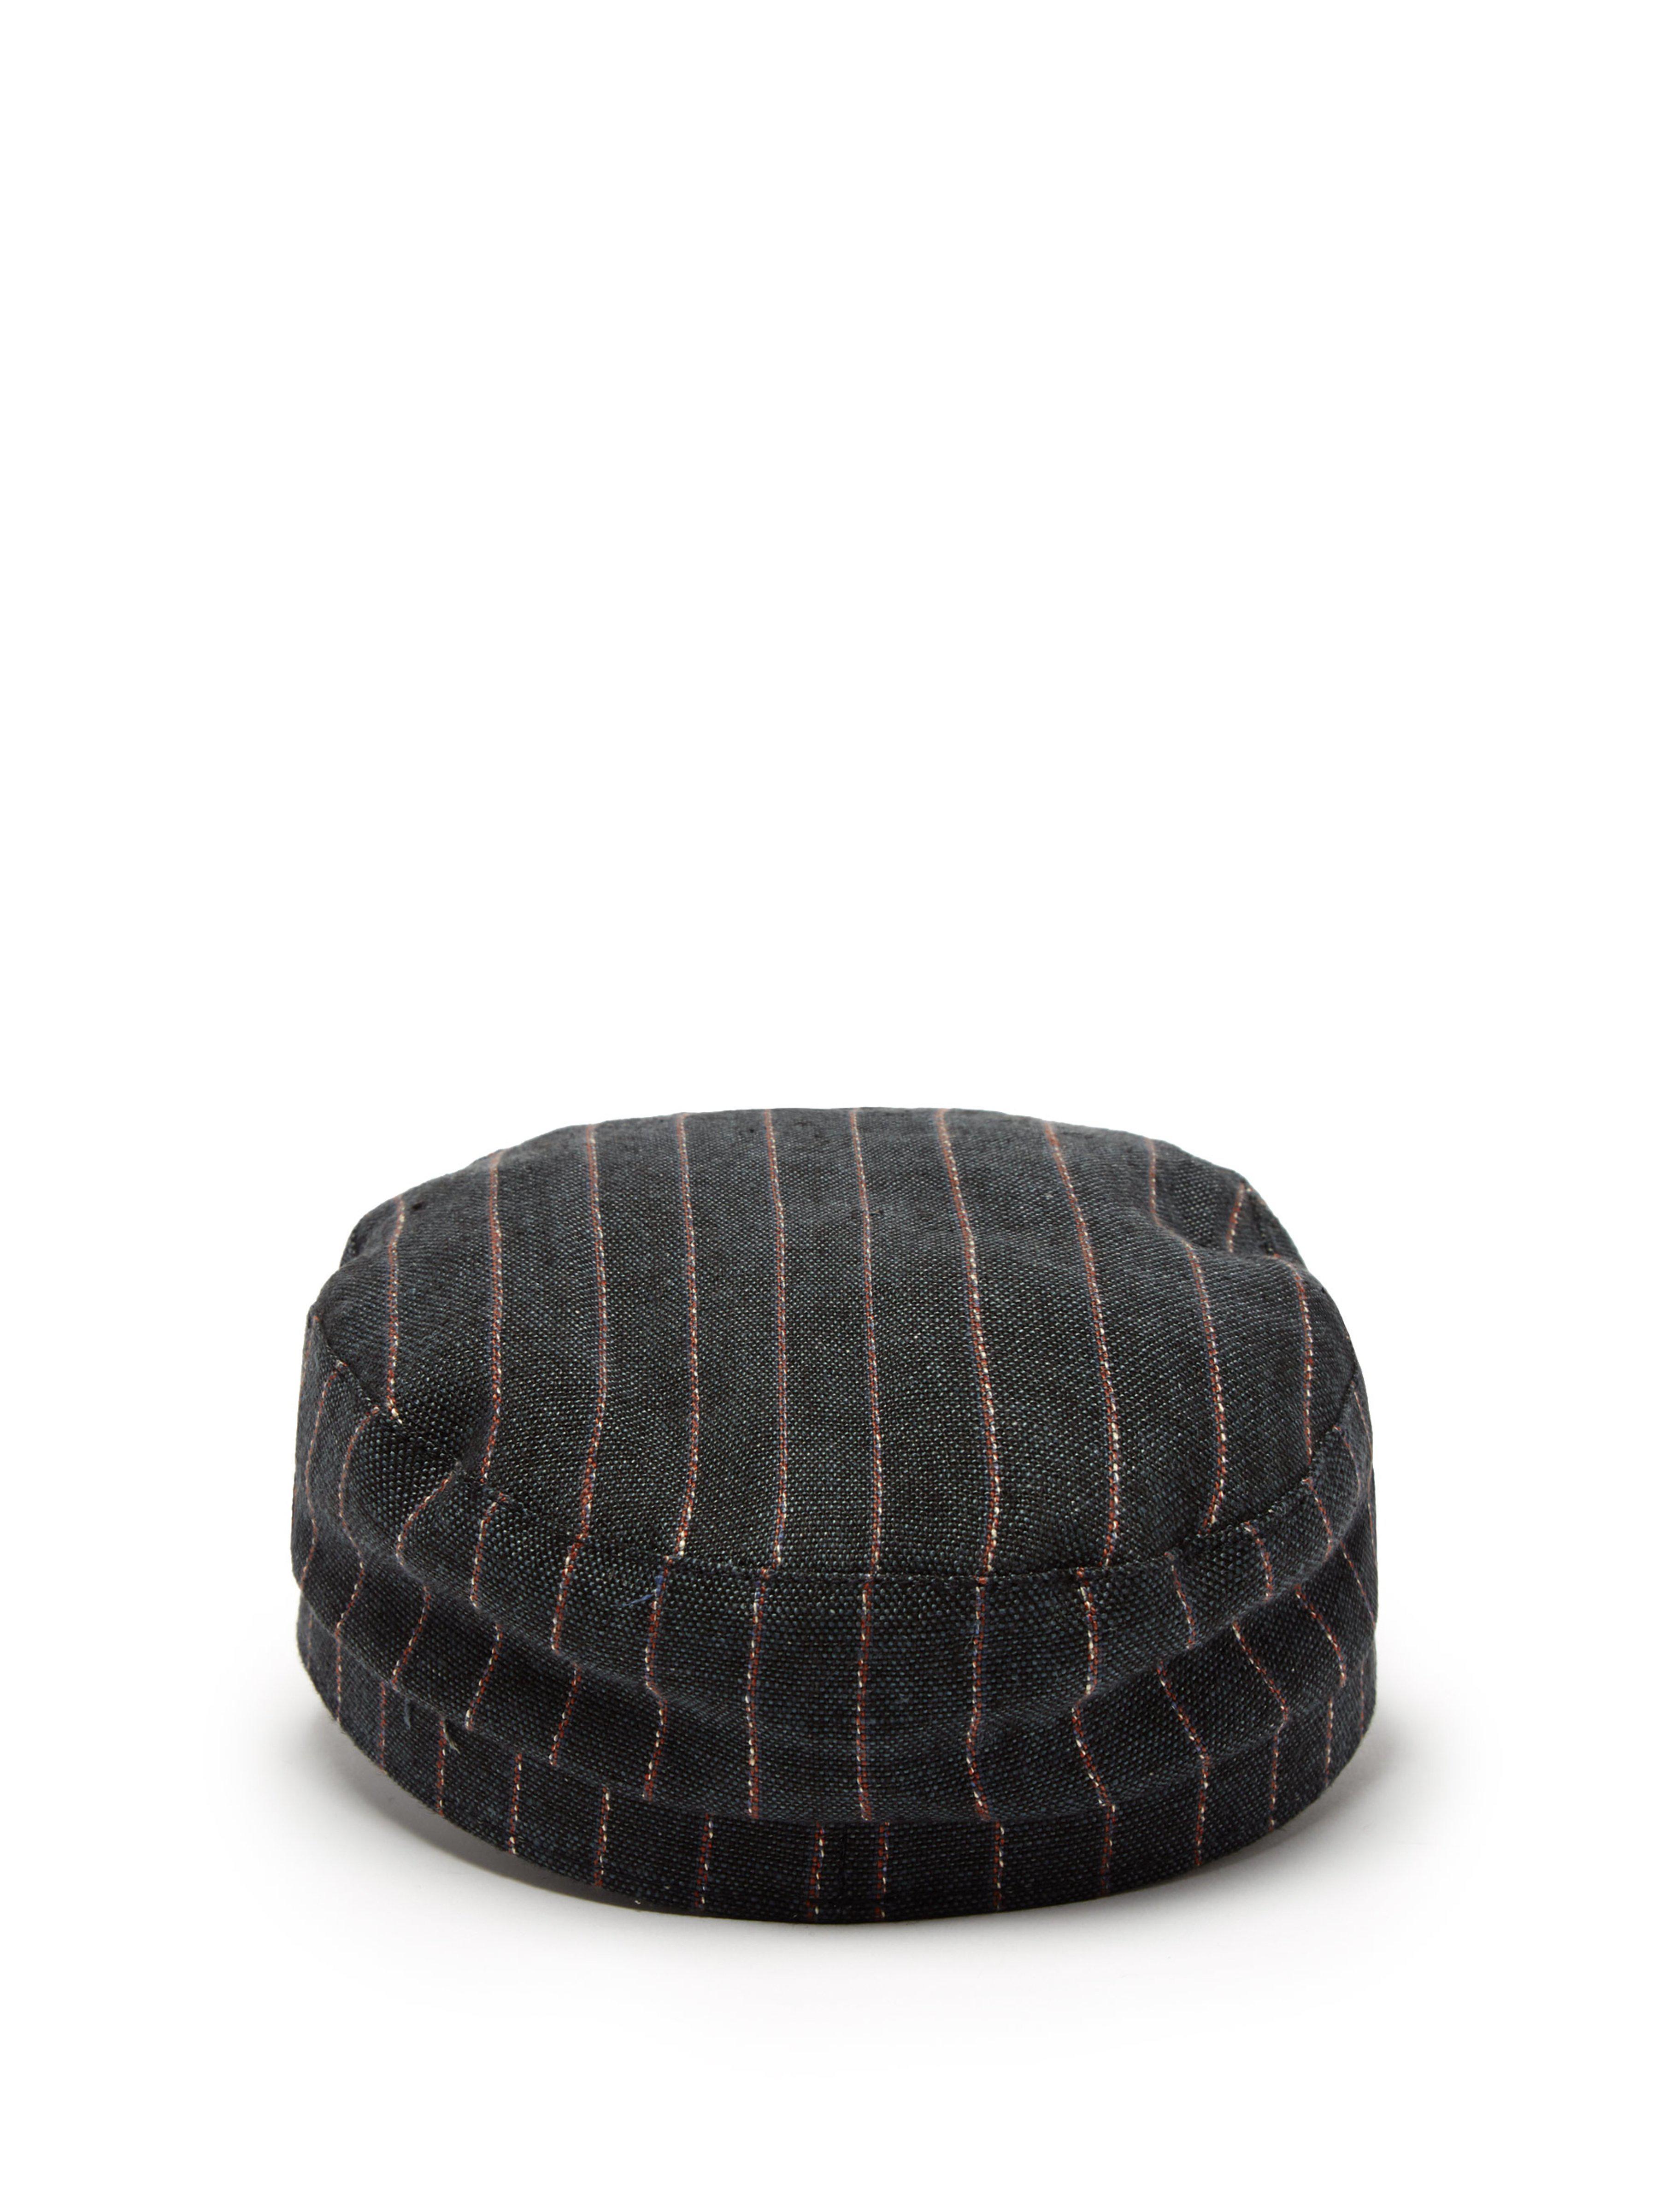 9354aeb9 Isabel Marant - Black Striped Linen Captain's Hat - Lyst. View fullscreen